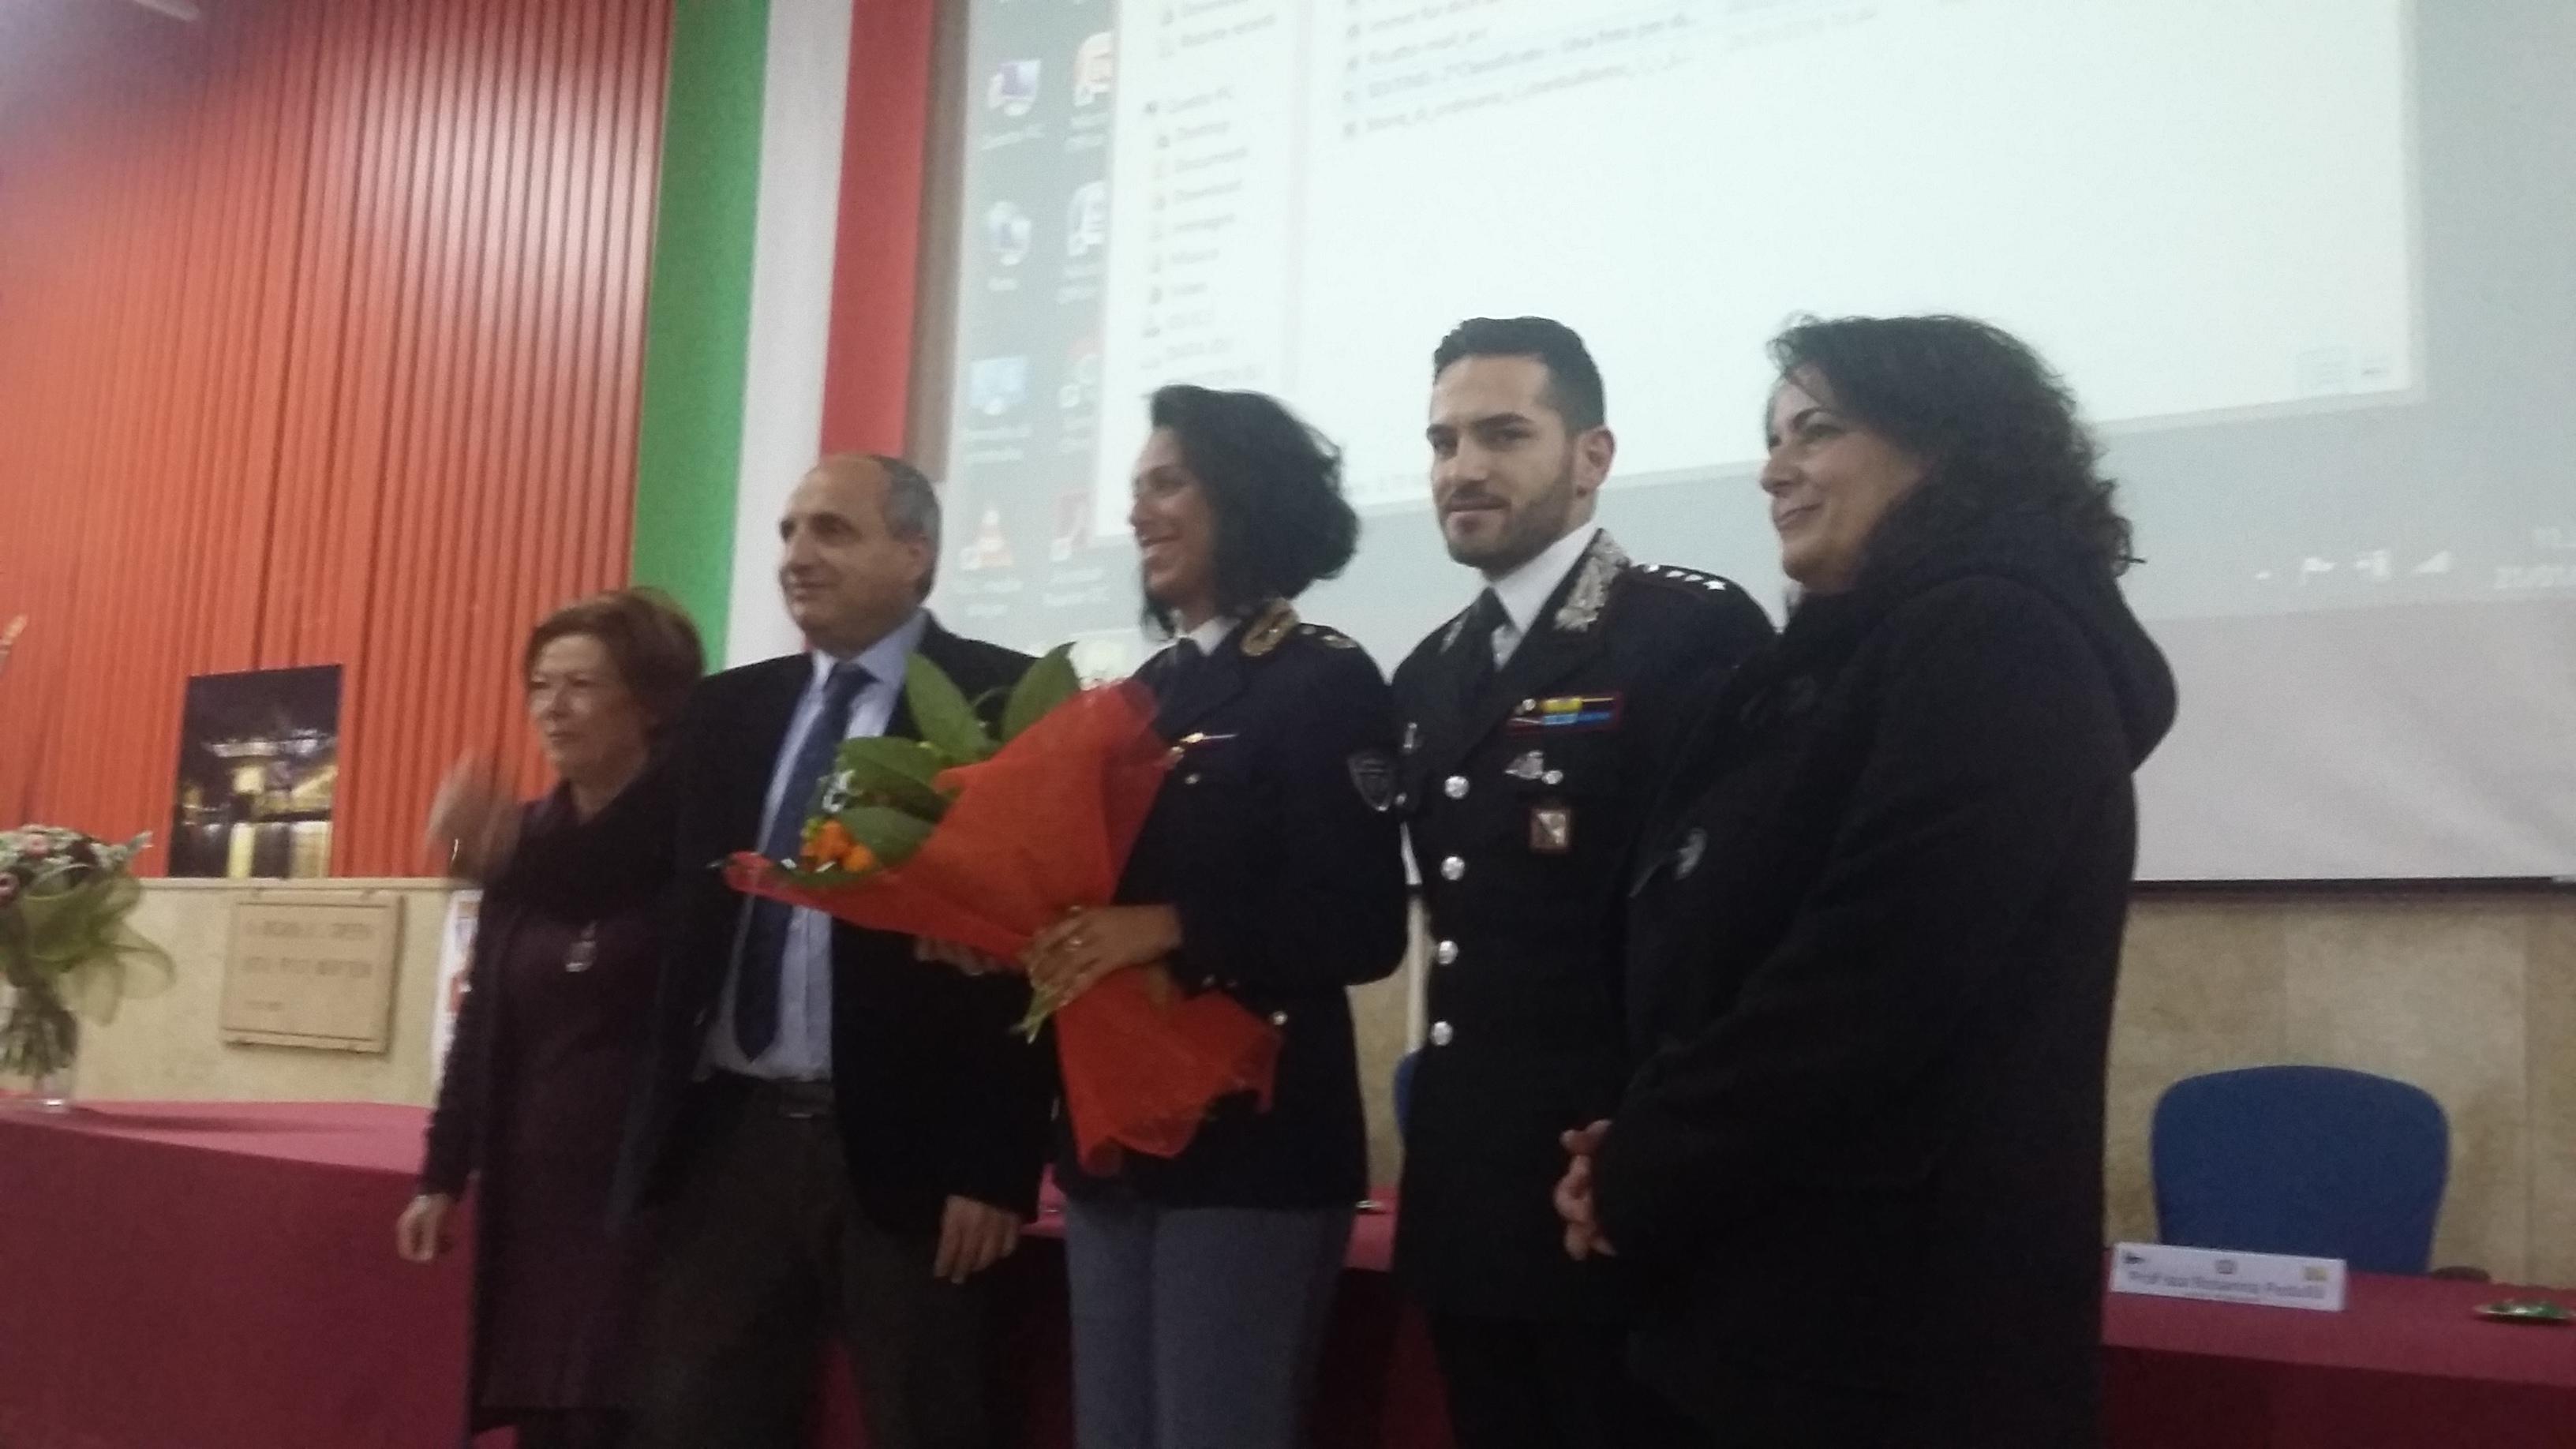 Lombardia, legge contro cyberbullismo